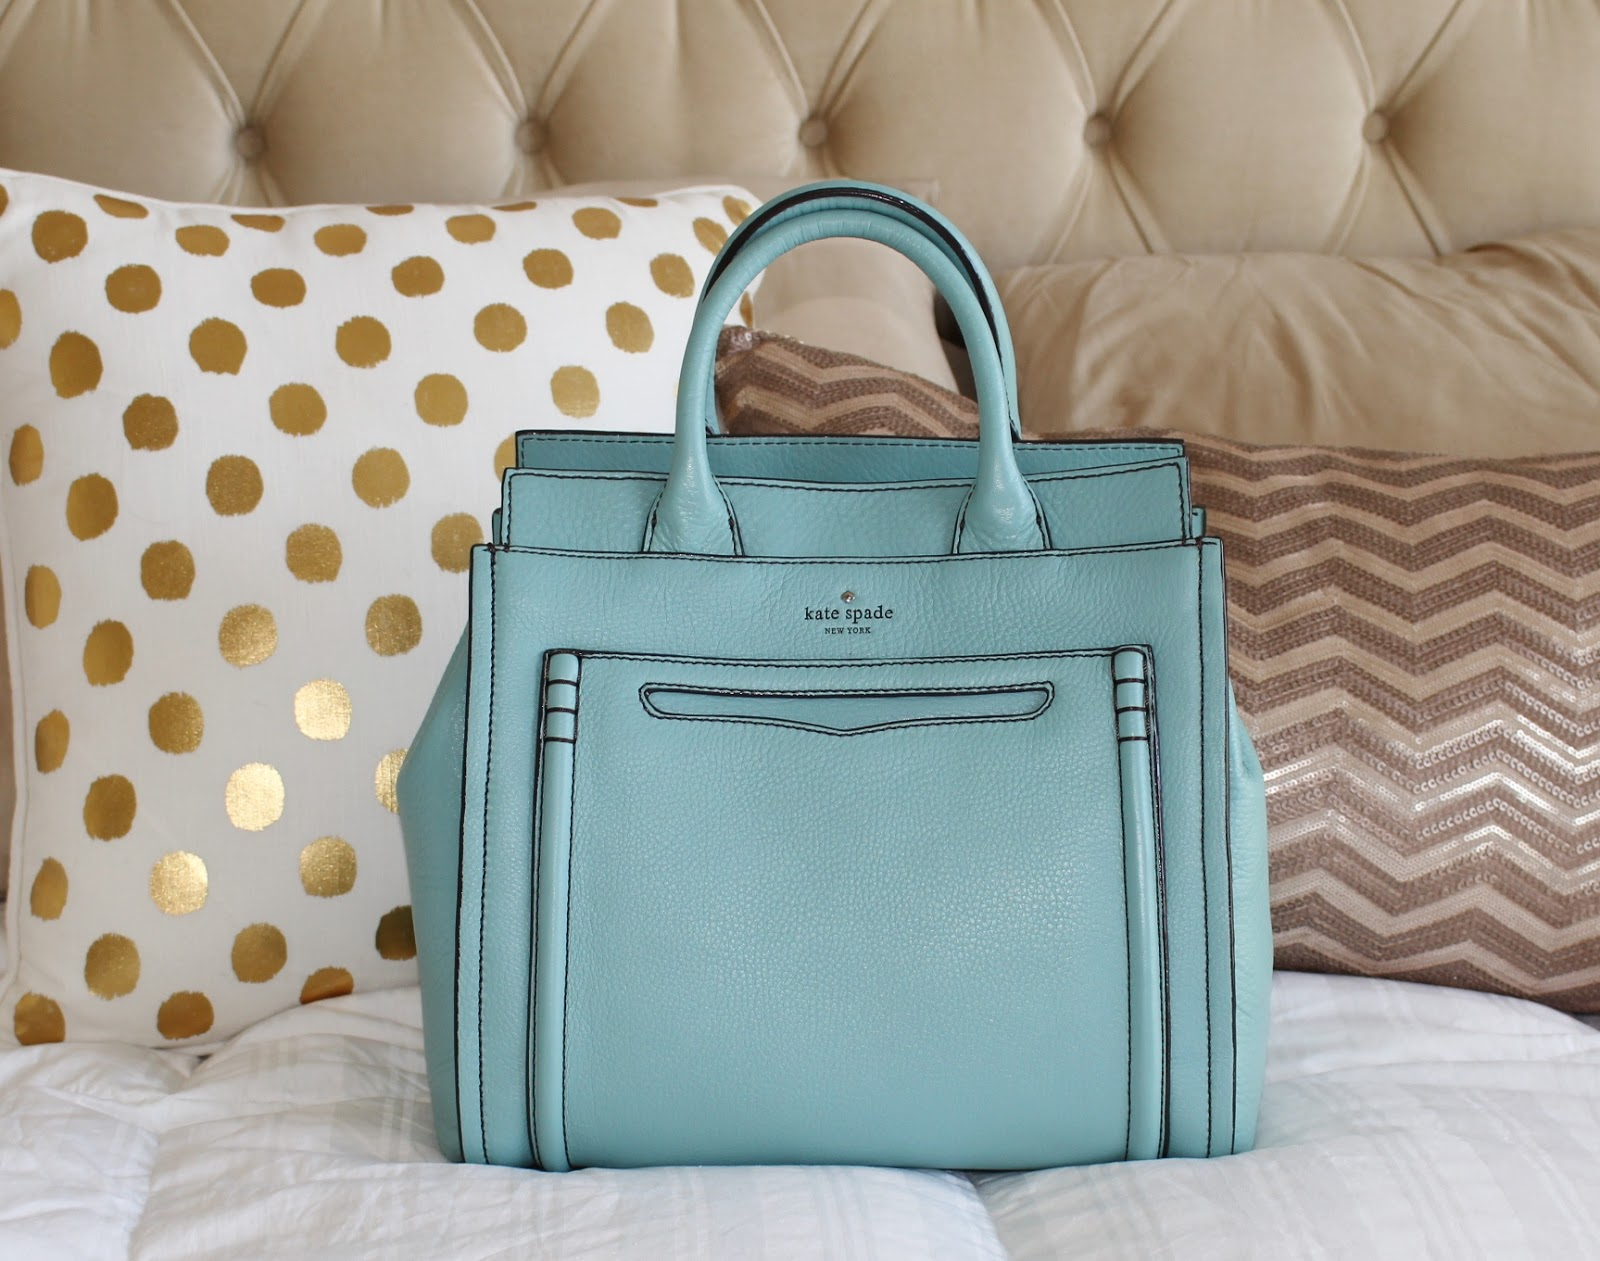 New Spring Summer Bag Kate Spade